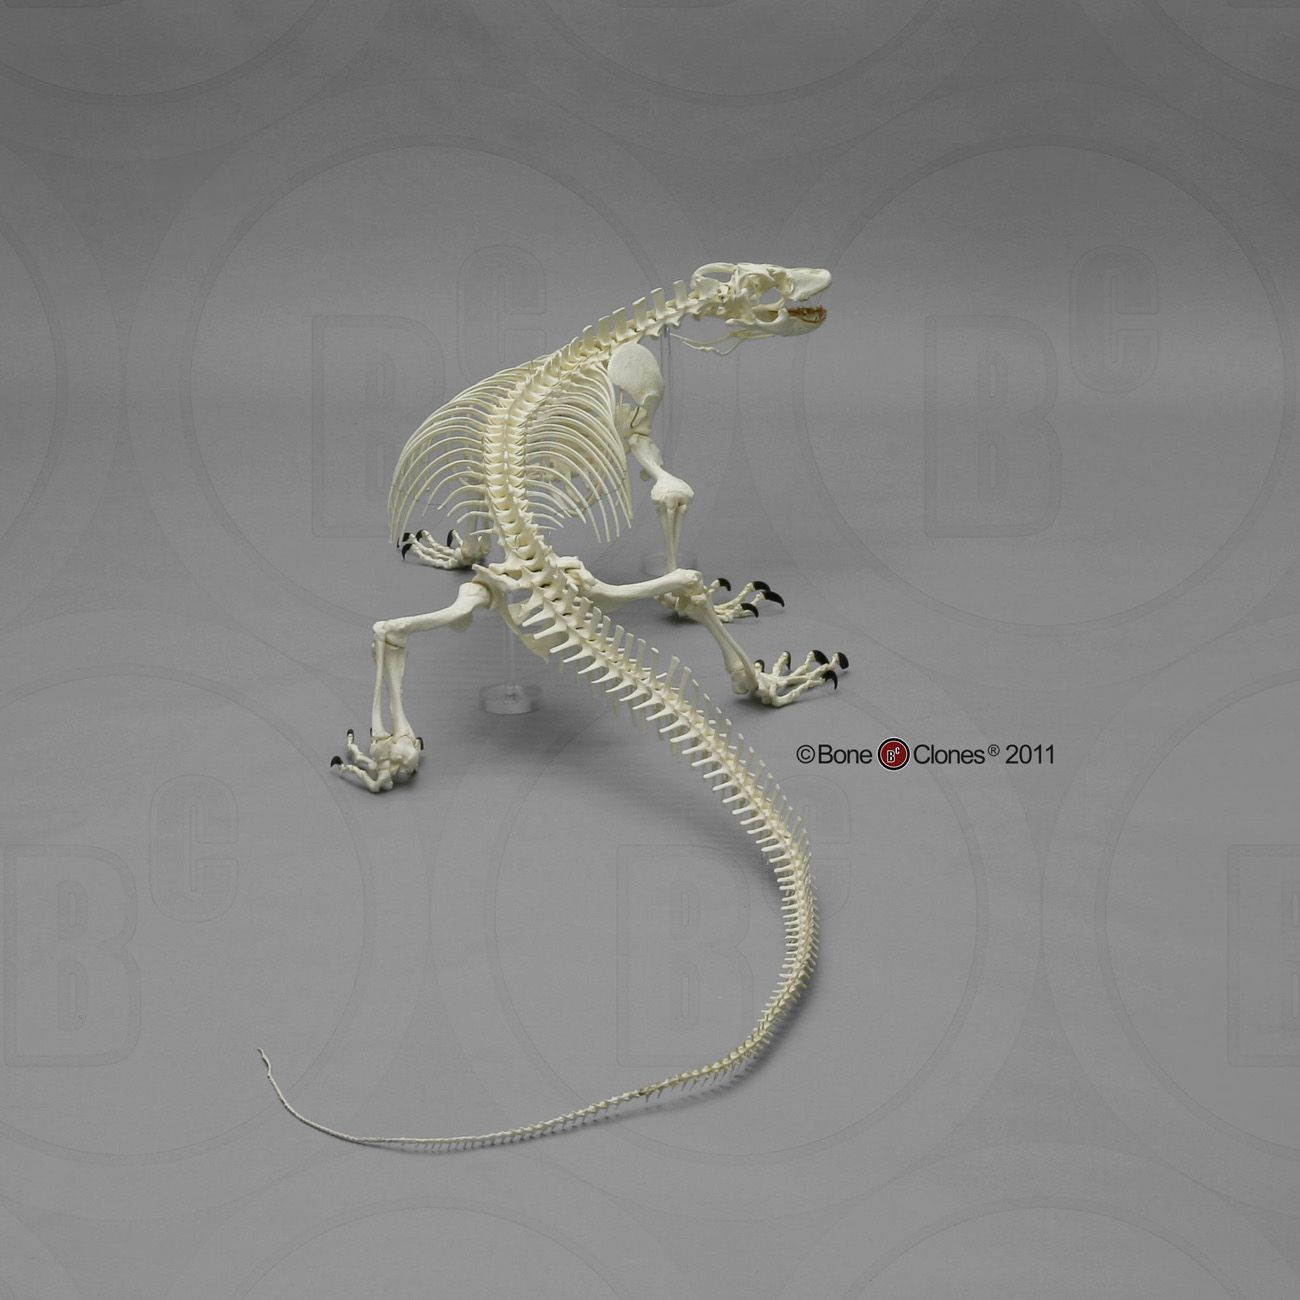 sc-027-a-d-Logo.jpg 1,300×1,300 pixels | lizards | Pinterest ...